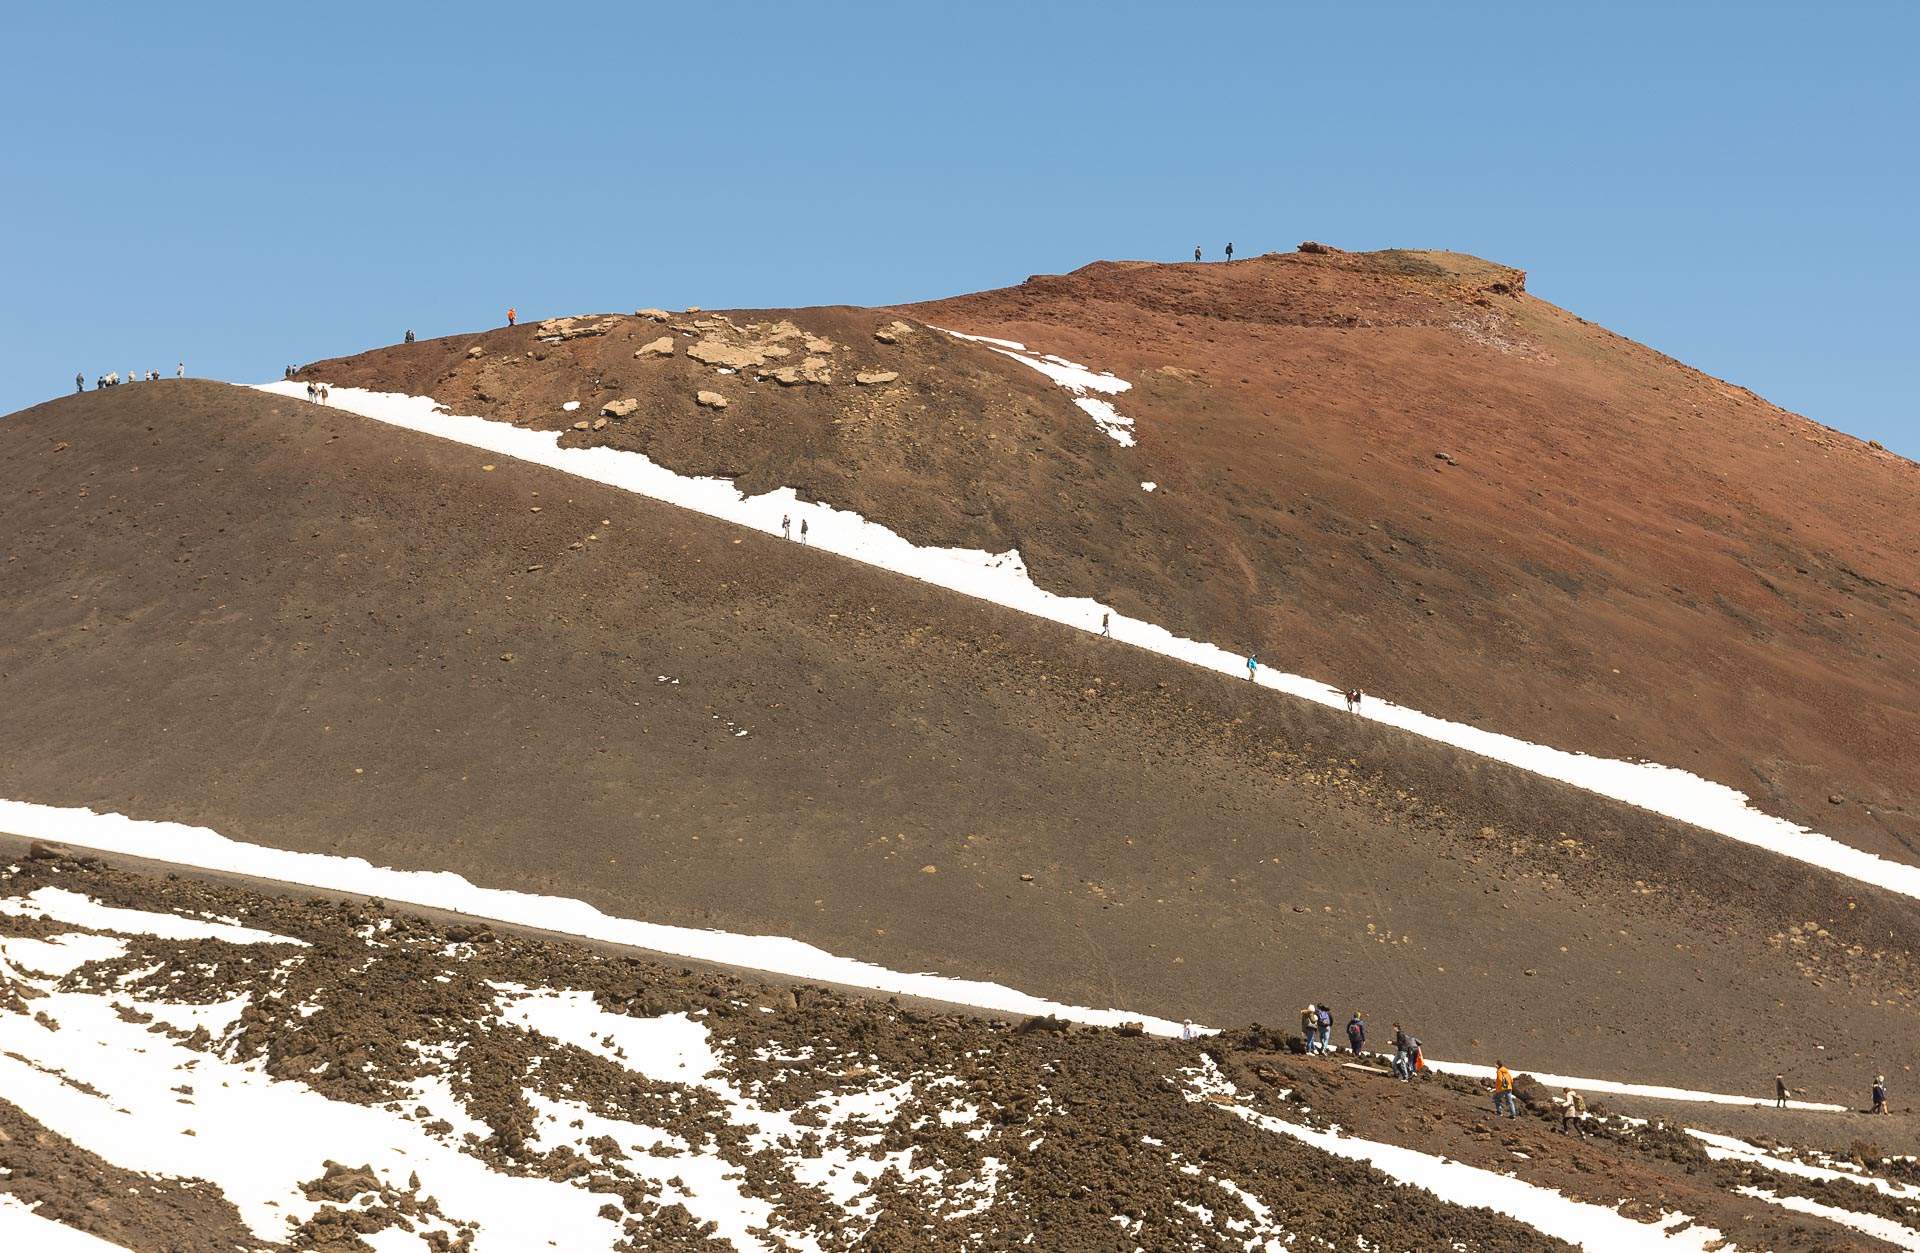 Boczny stożek wulkanu Etna